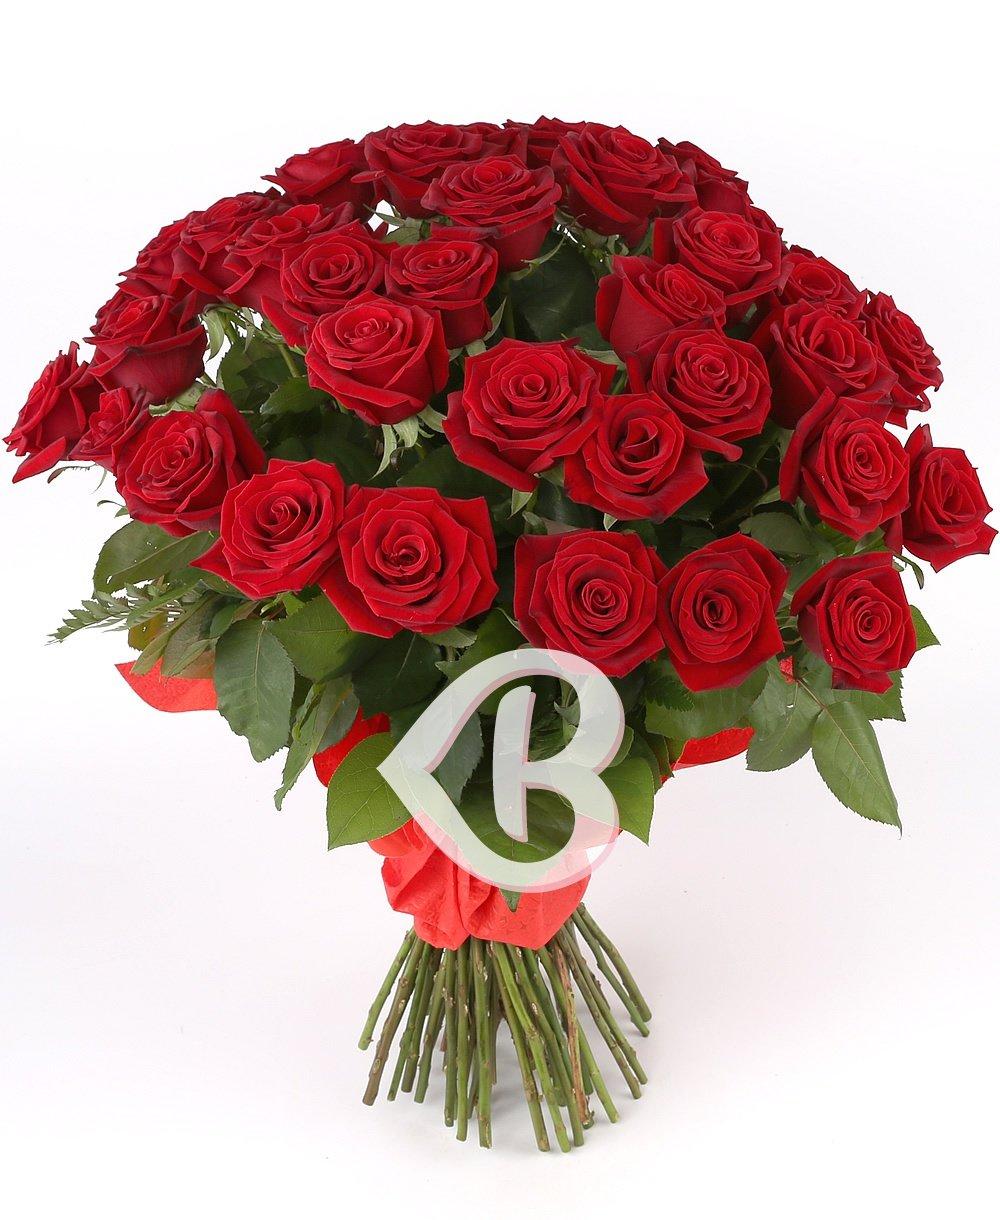 Imaginea produsului 39 Trandafiri Roșii